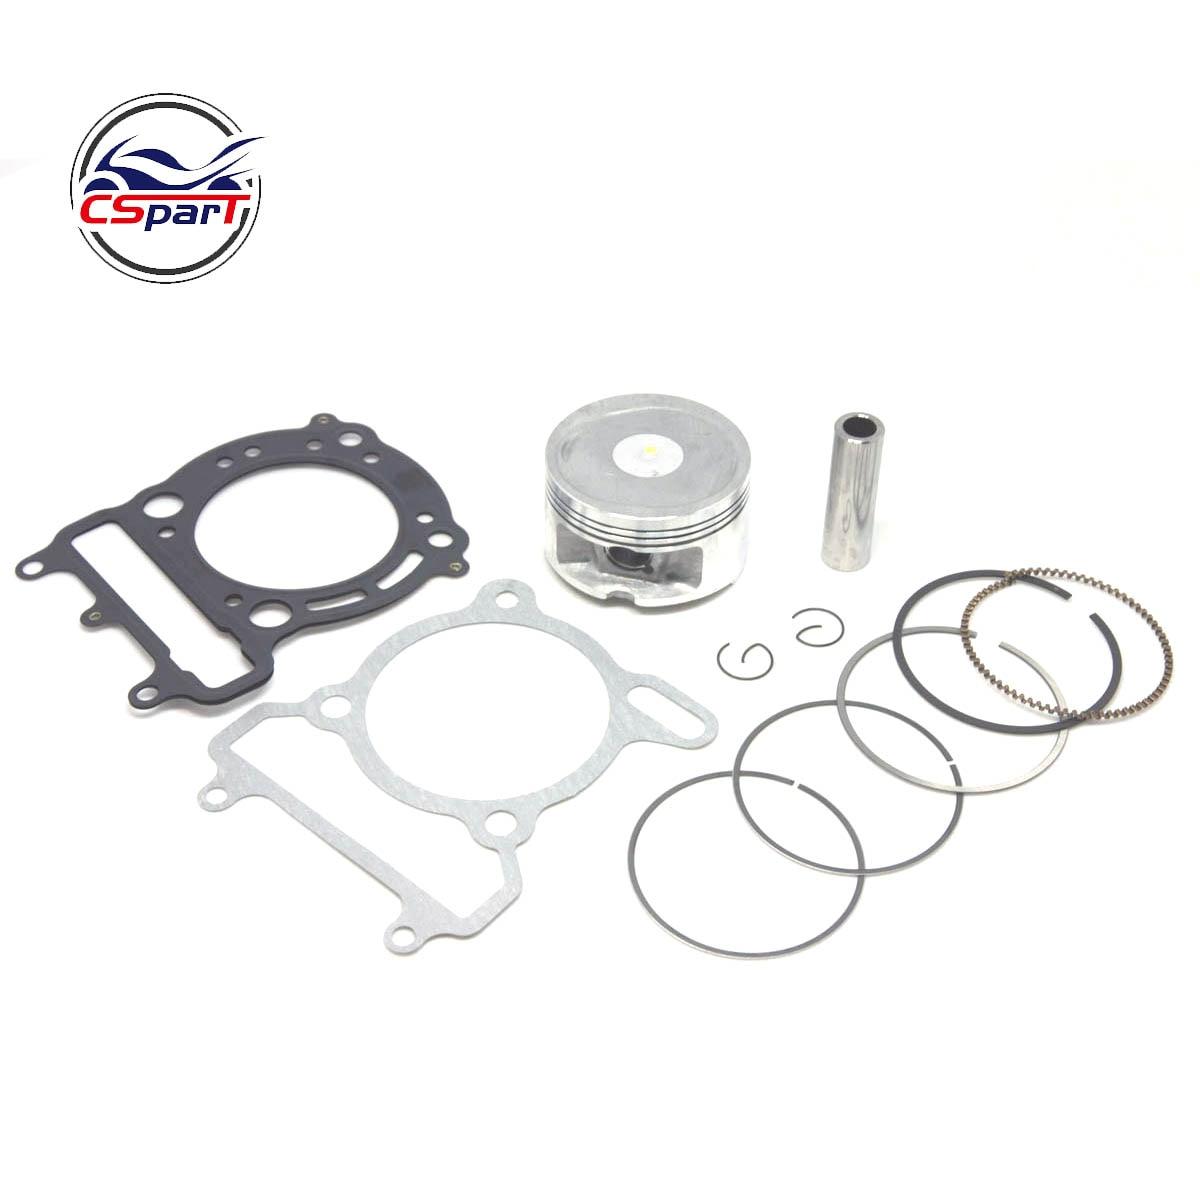 Linhai 520 520CC LH2V70 Piston Ring Gasket Kit ATV UTV Parts